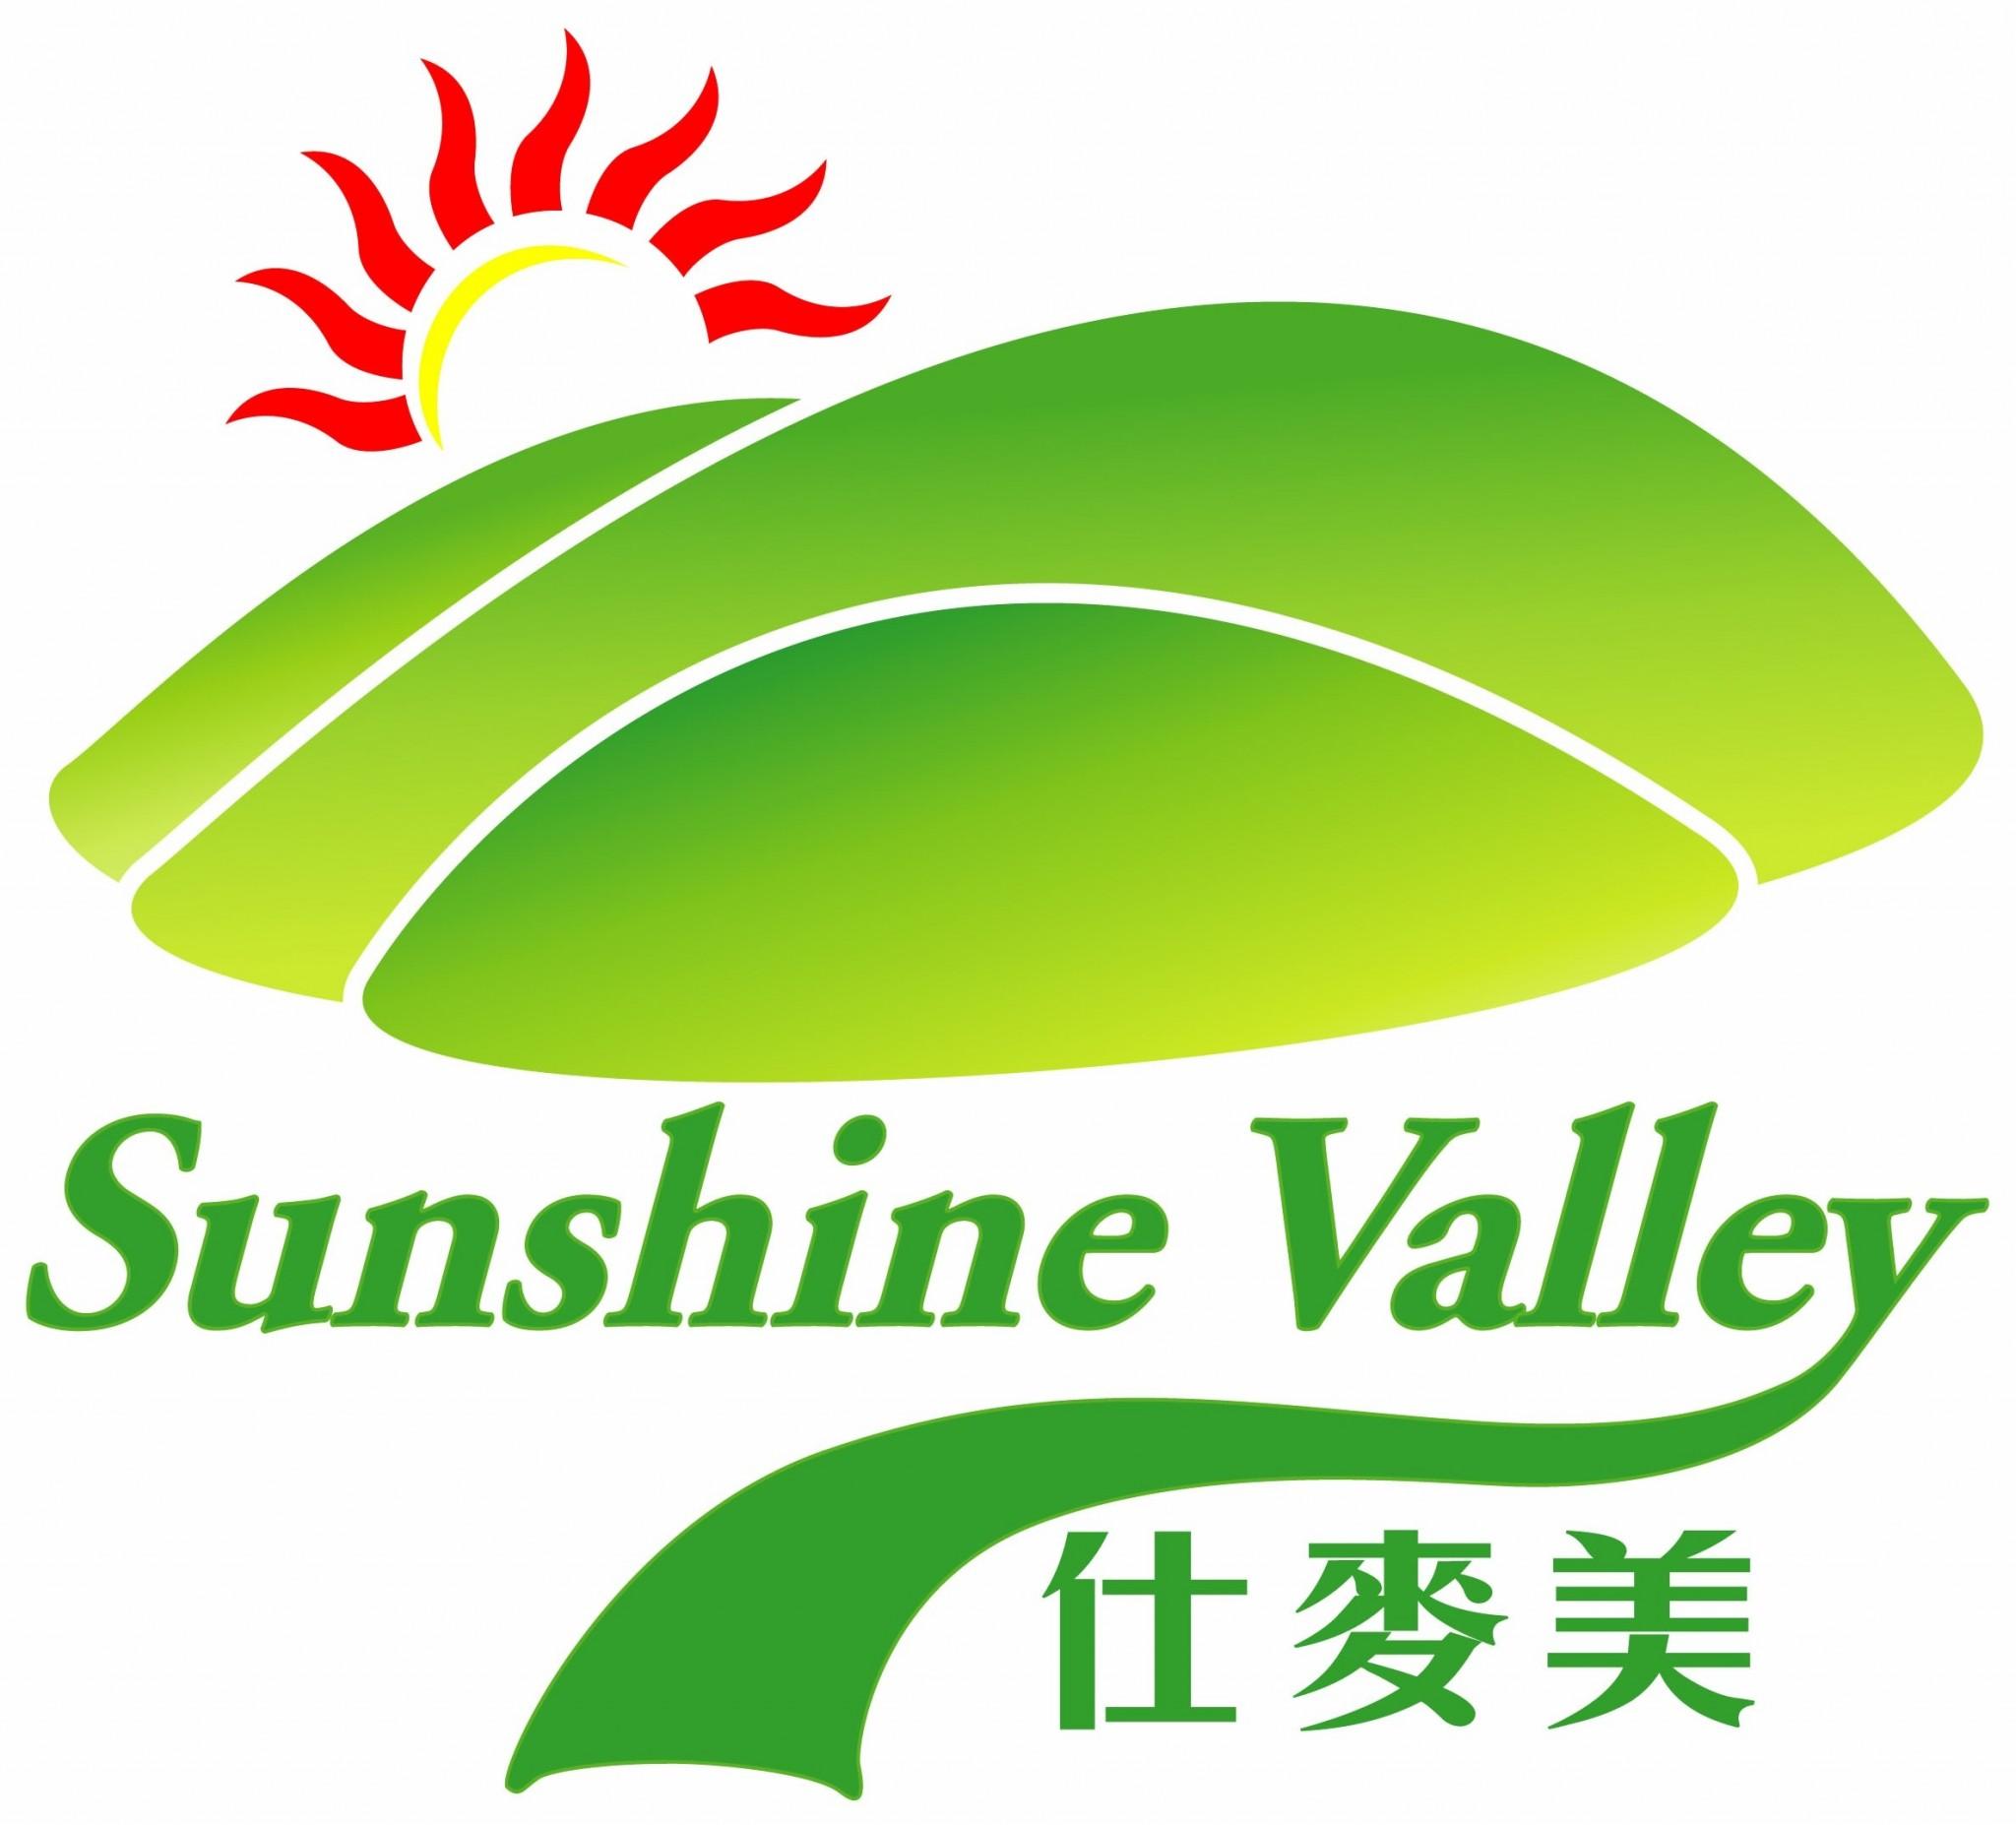 Sunshinevalley